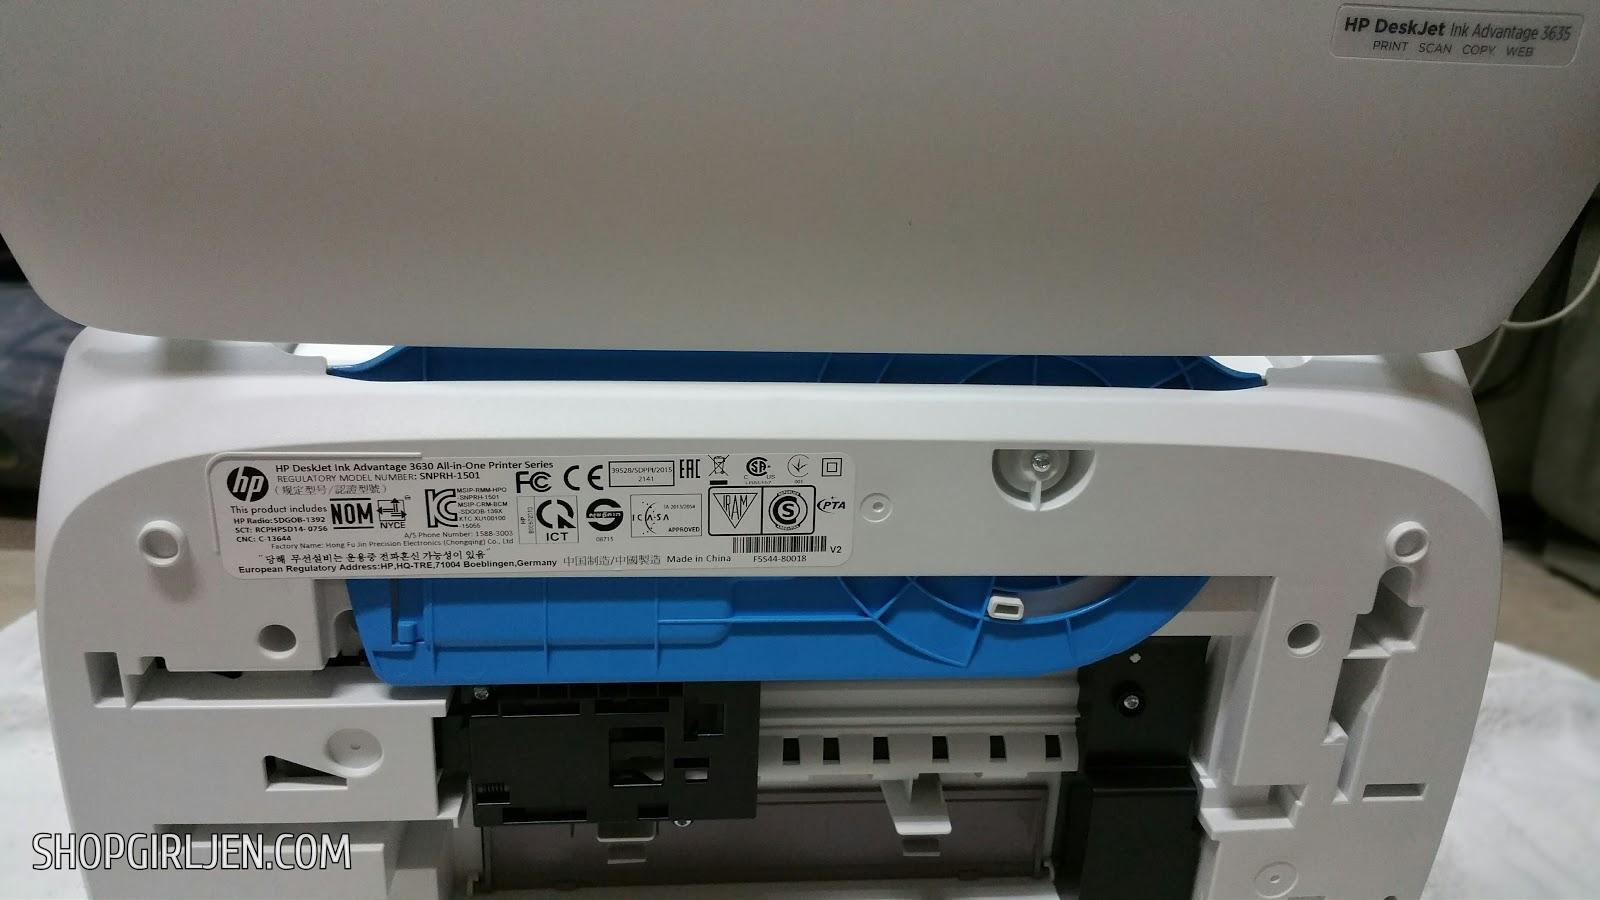 hp deskjet ink advantage 3630 all-in-one printer series download